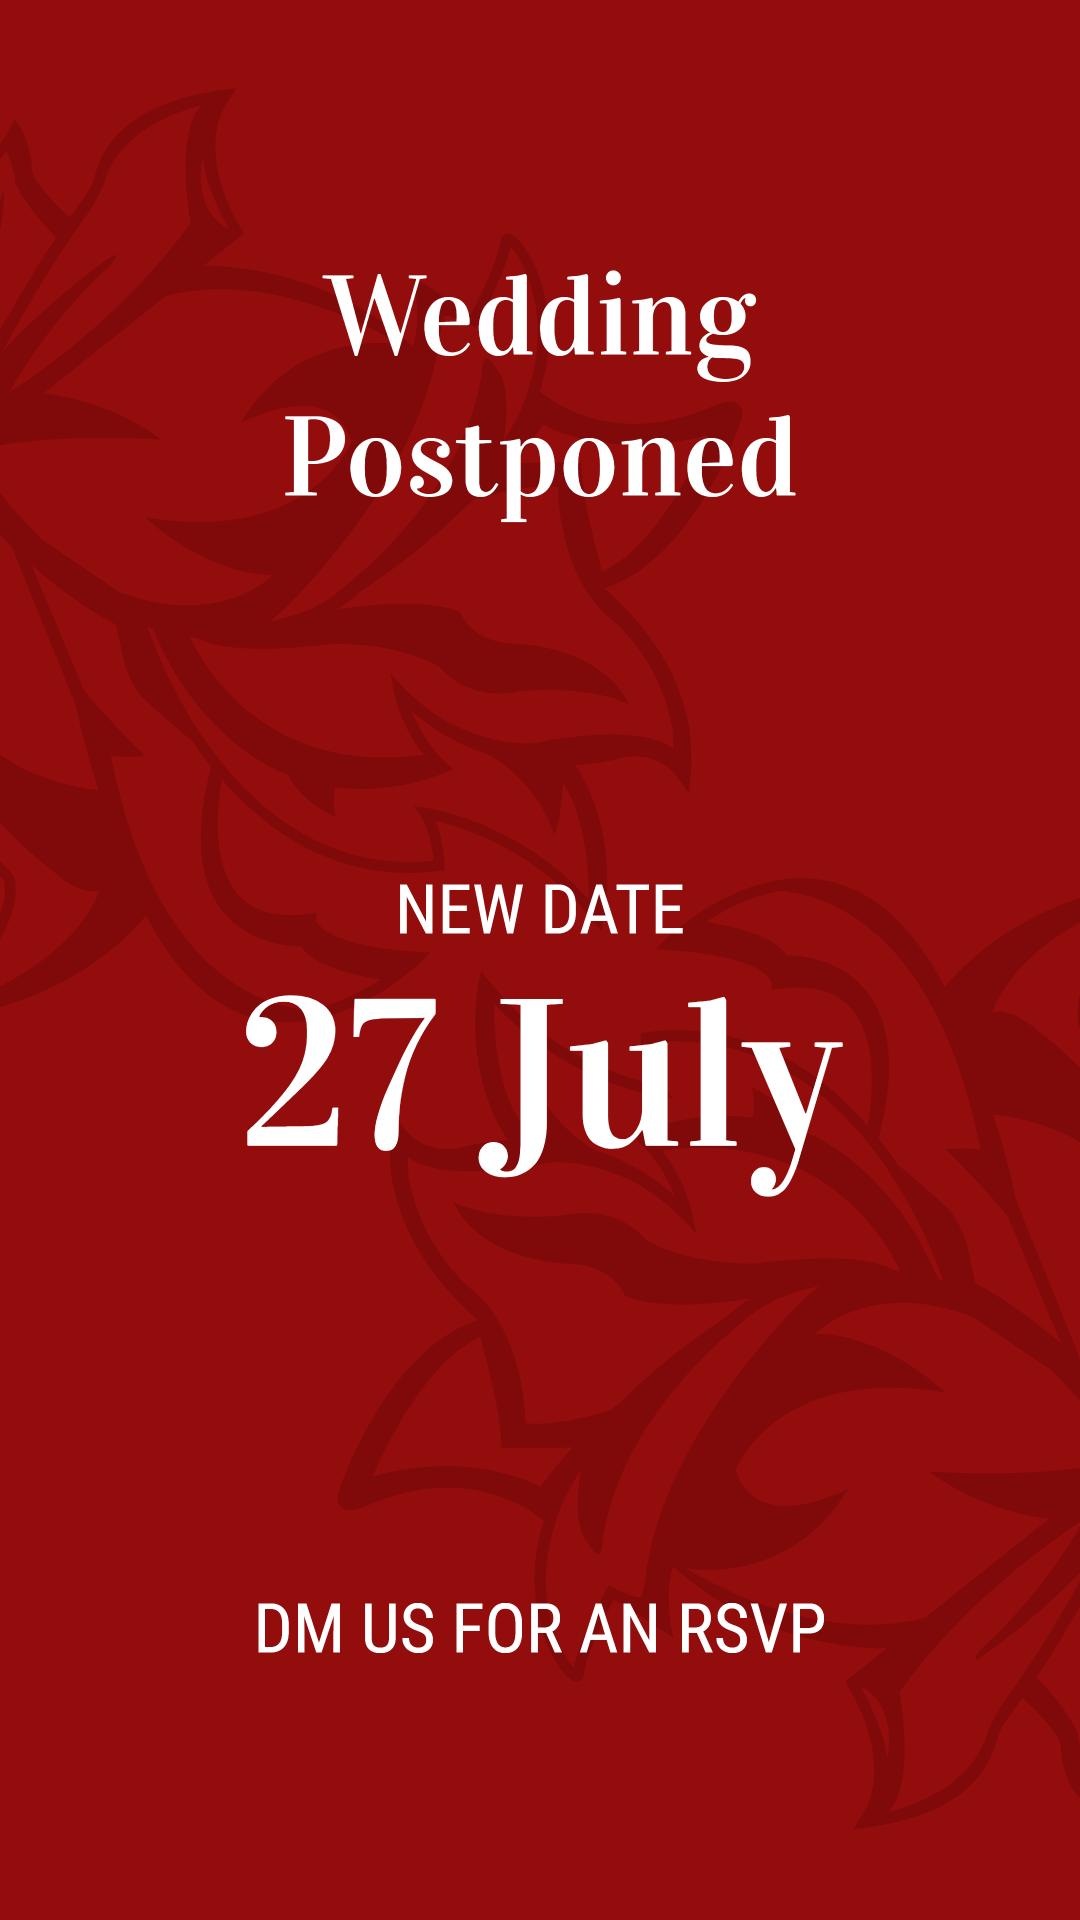 Wedding Postpones to 27 July